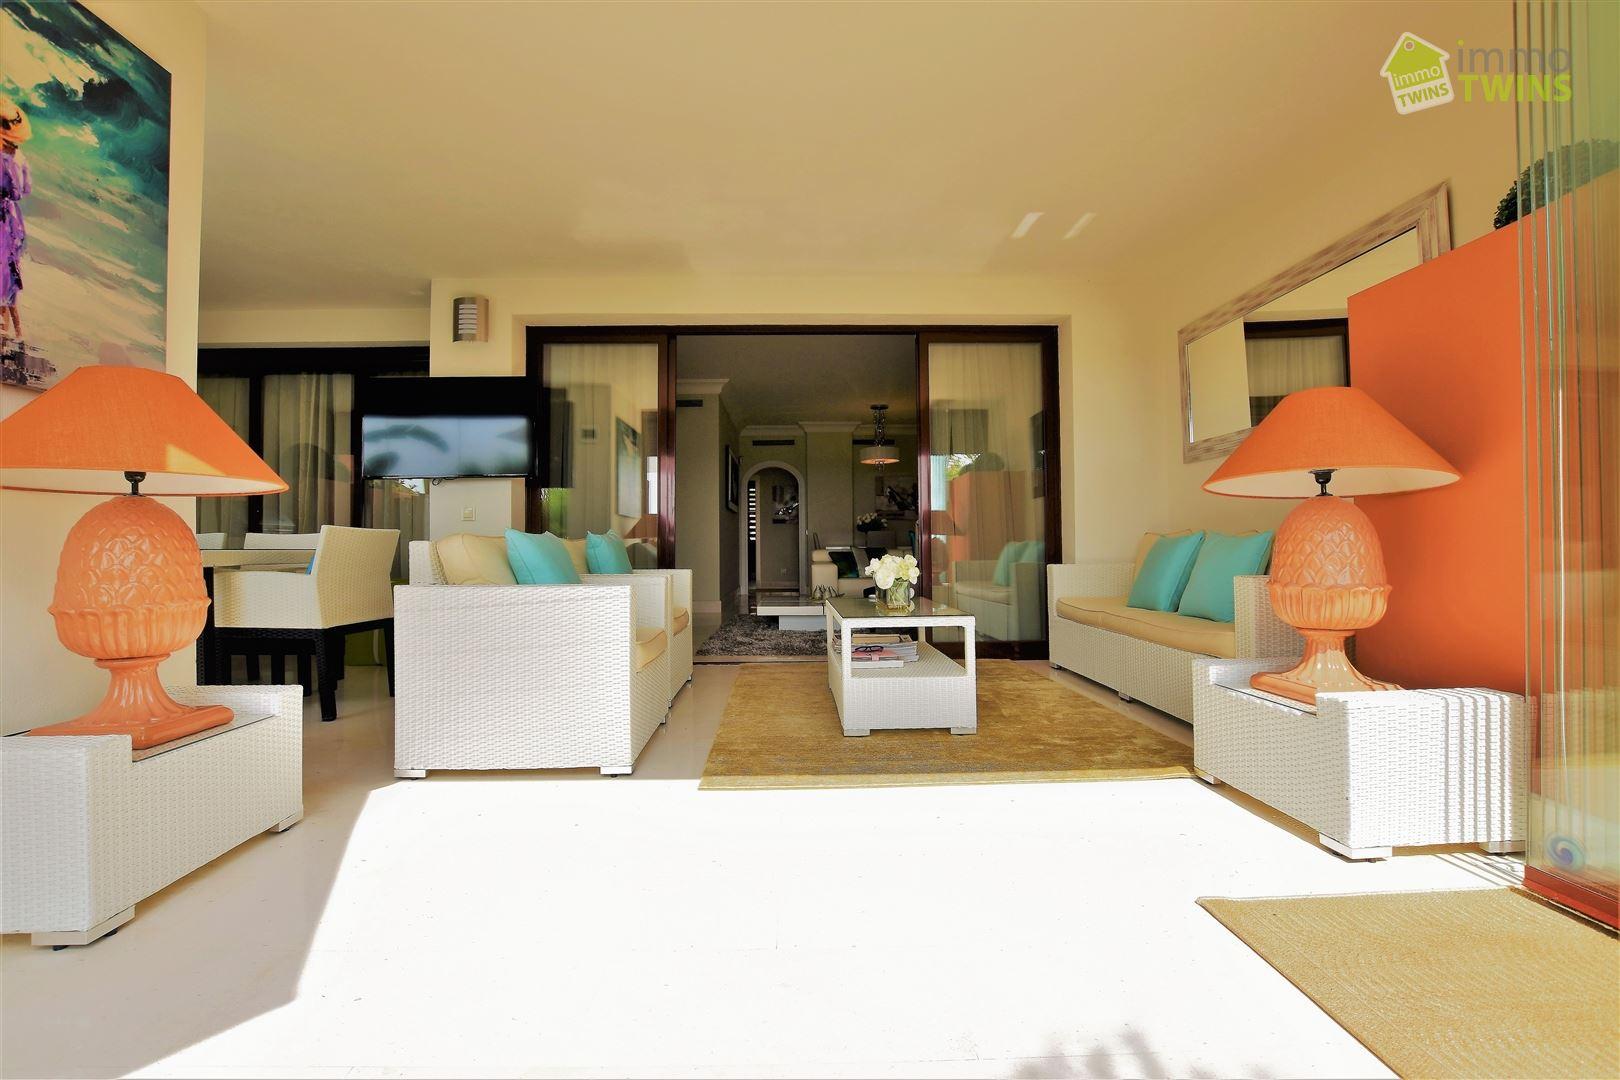 Foto 7 : Appartement te 29679 MARBELLA (Spanje) - Prijs € 485.000